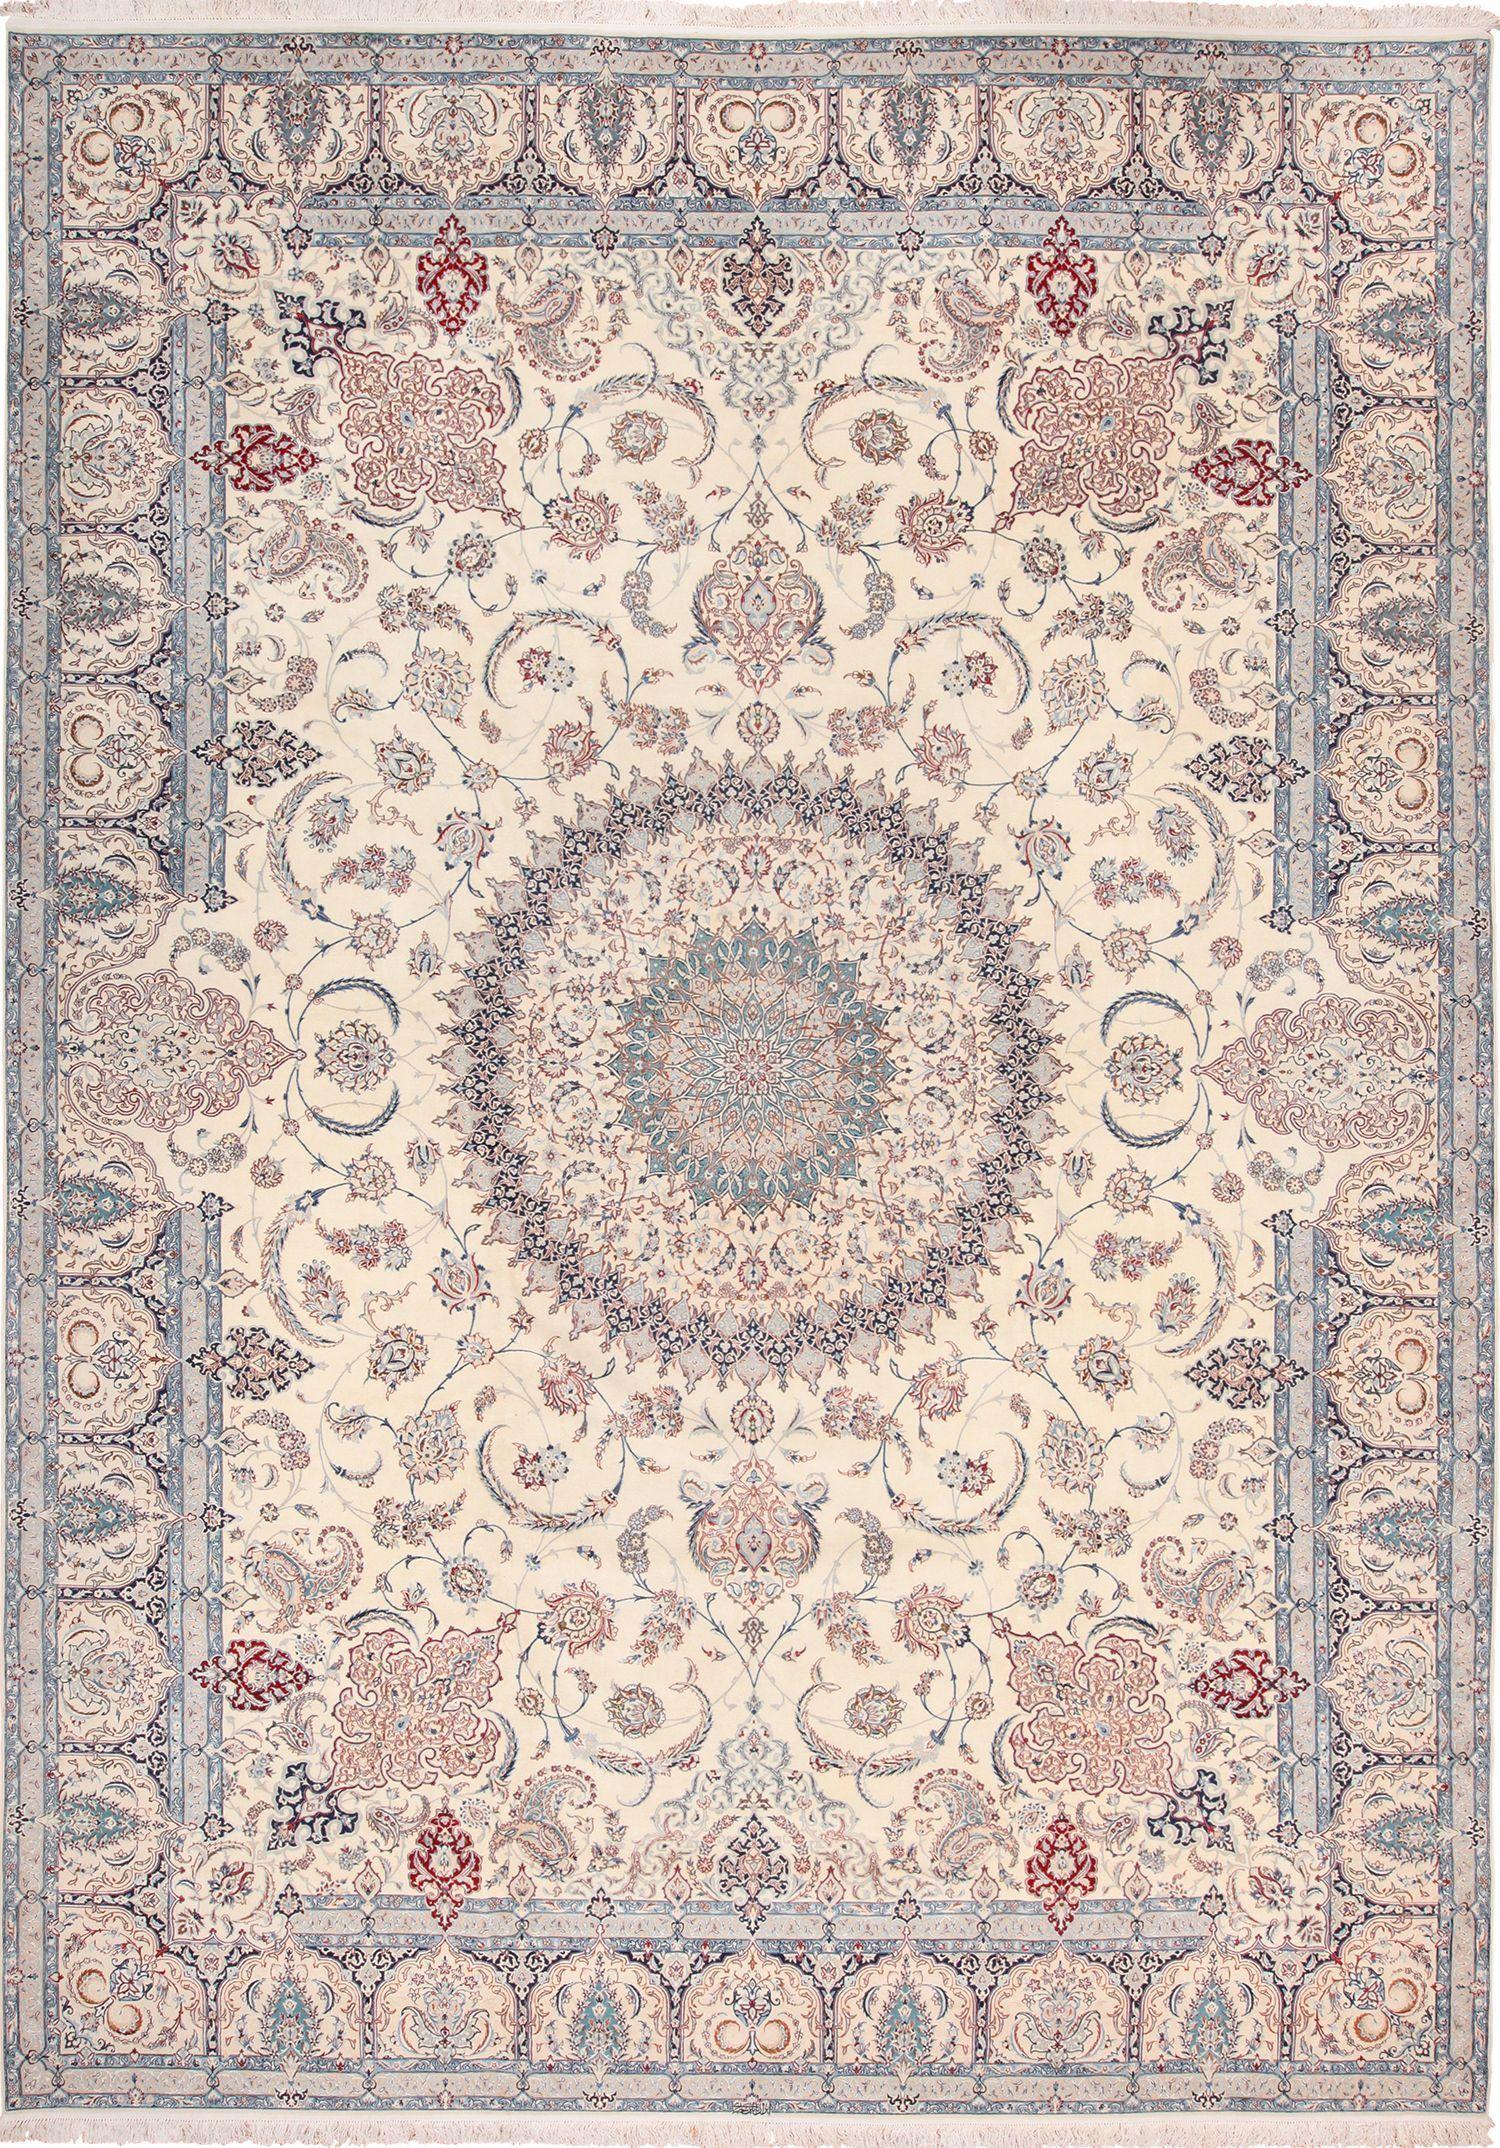 Vintage Silk And Wool Large Nain Persian Rug 60029 Persianrug Vintage Silk And Wool Large Nain Persian Rug 60029 By Nazmiyal Bej Hali Acem Halisi Kilim